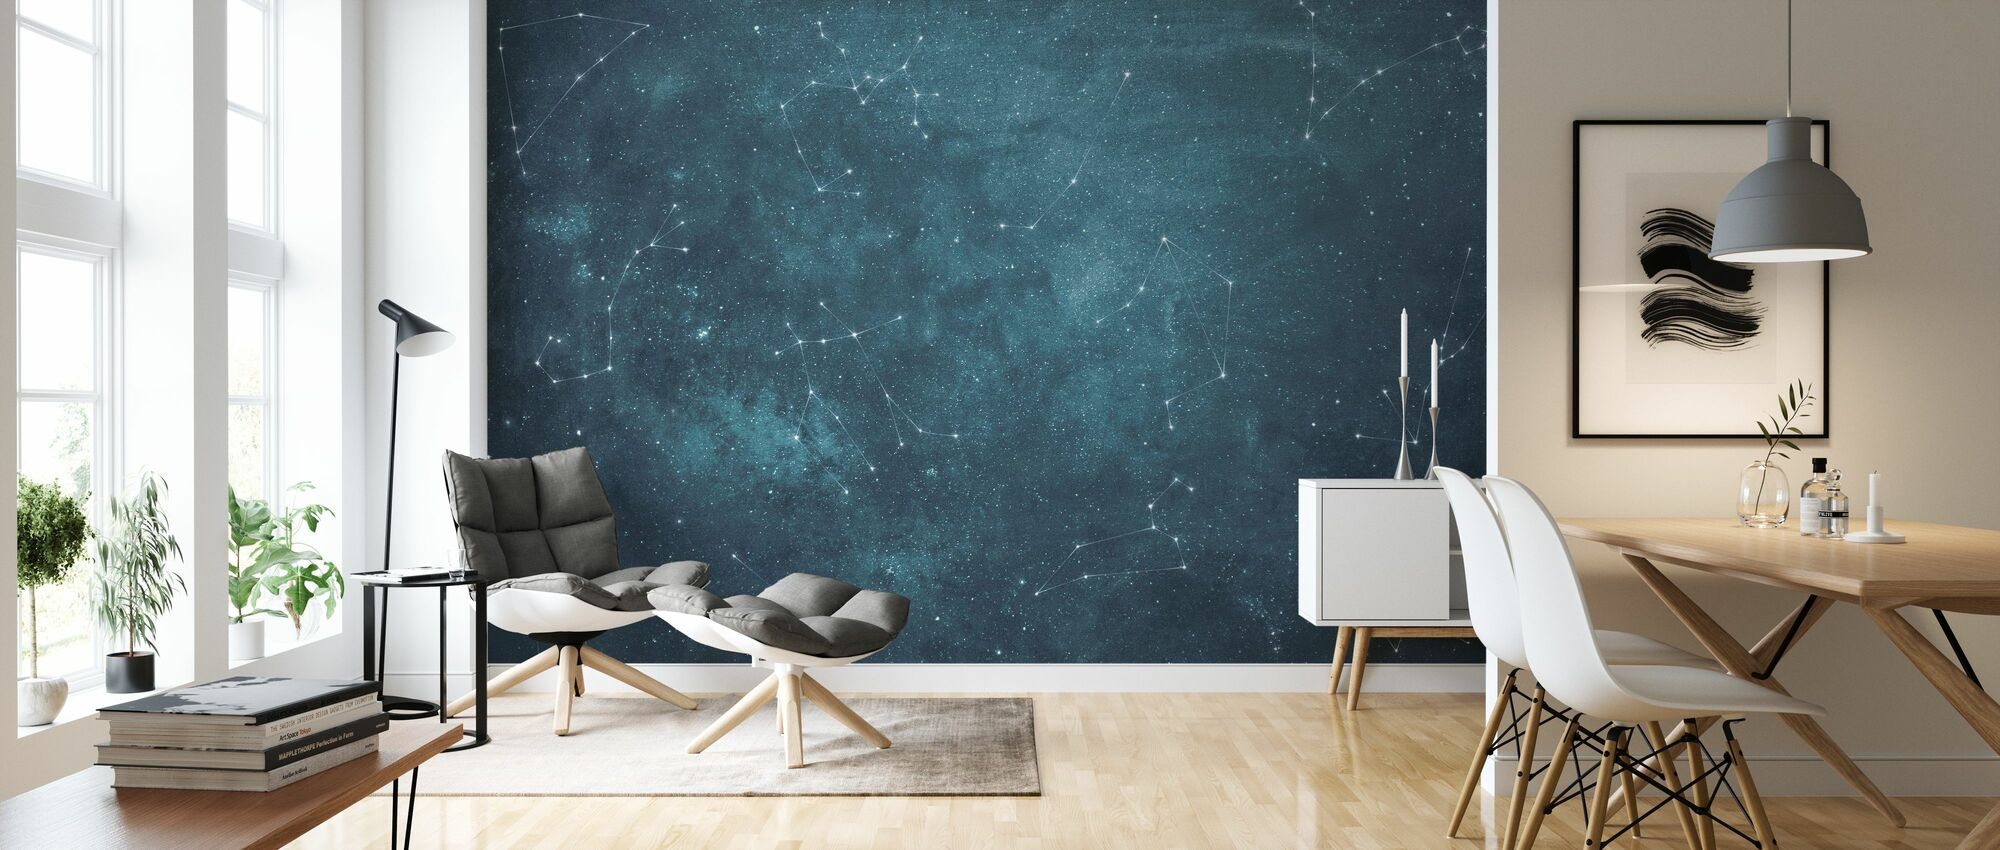 Zoodiac Sky III - Wallpaper - Living Room